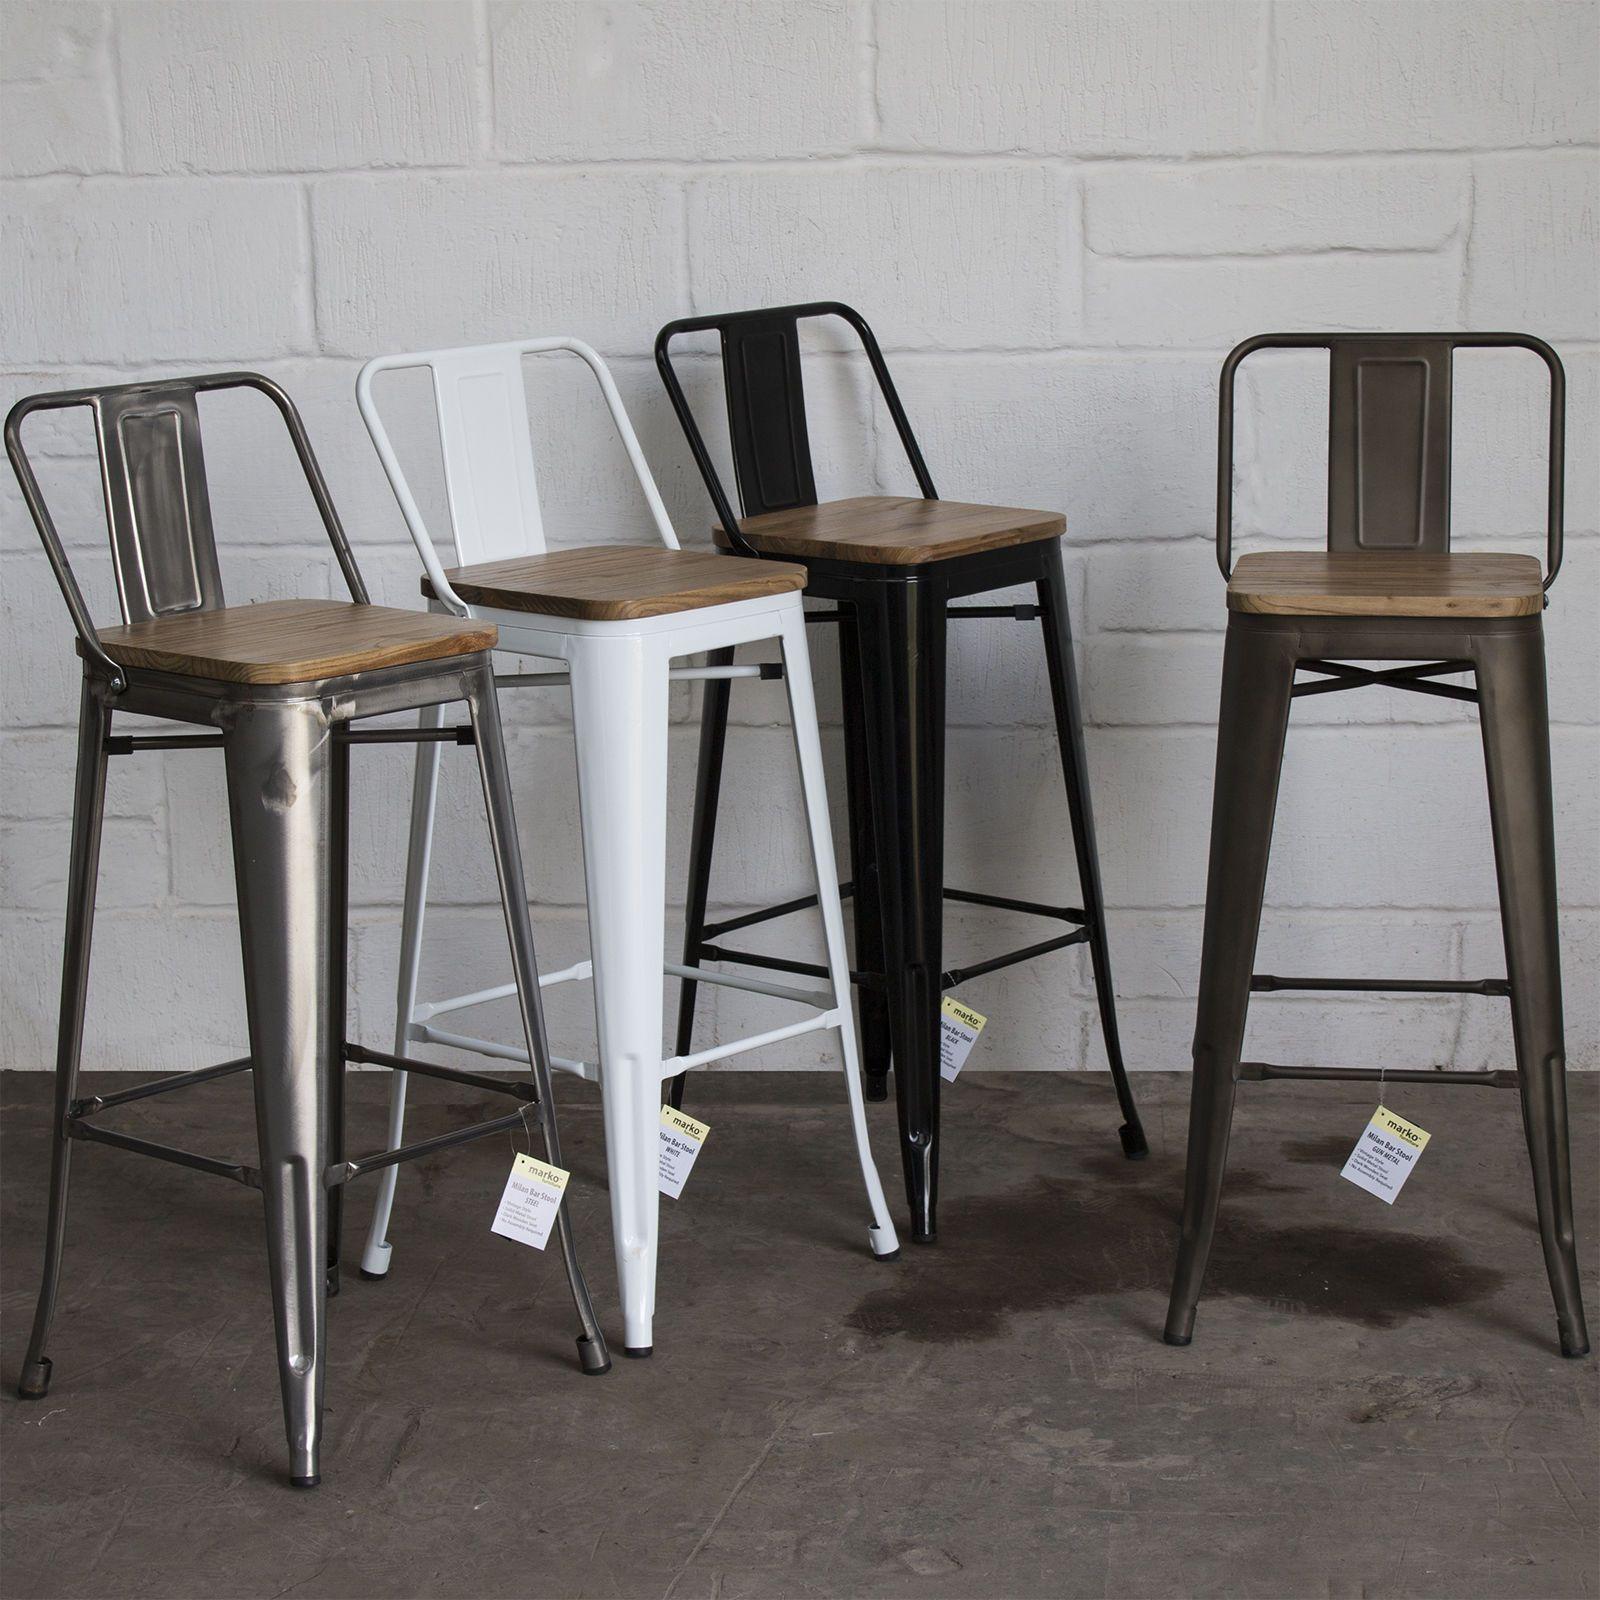 csbs wsg brw corkscrew stool bar industrial